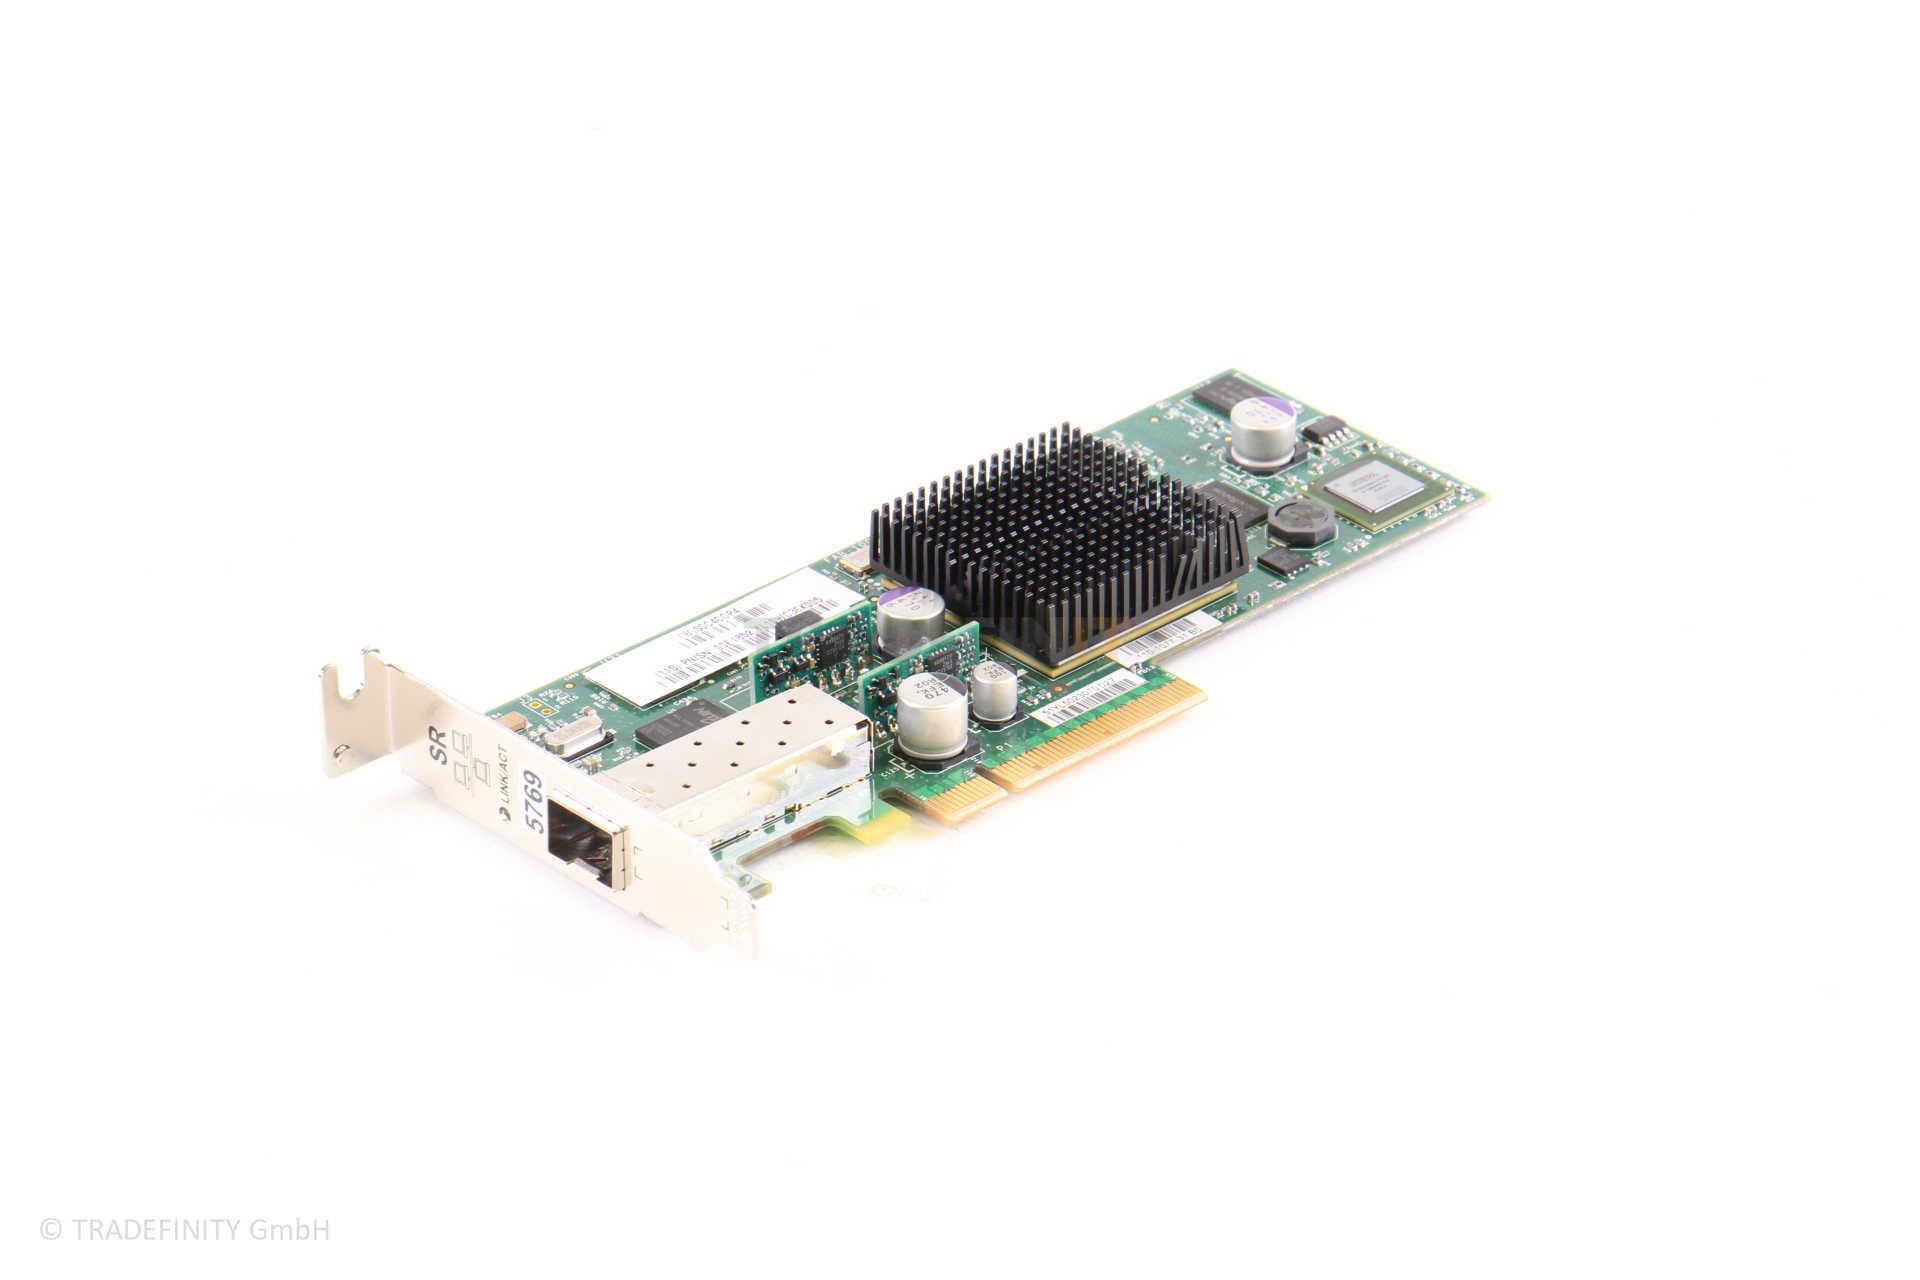 1-Port 10 Gbps Ethernet SR Adapter